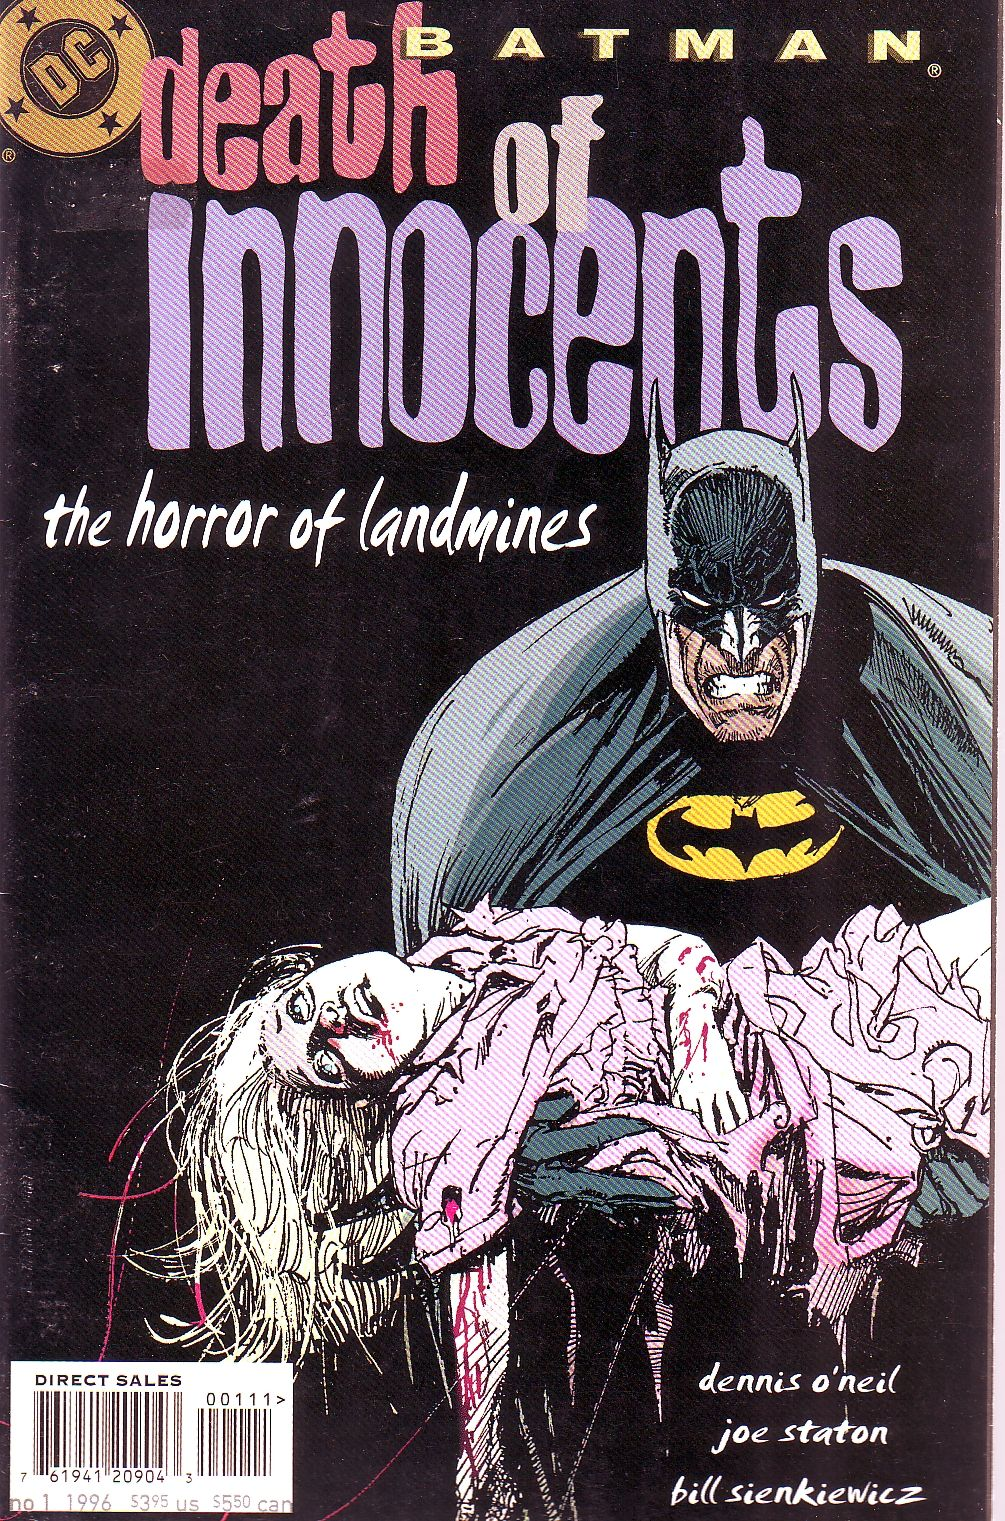 Batman/ death of innocents